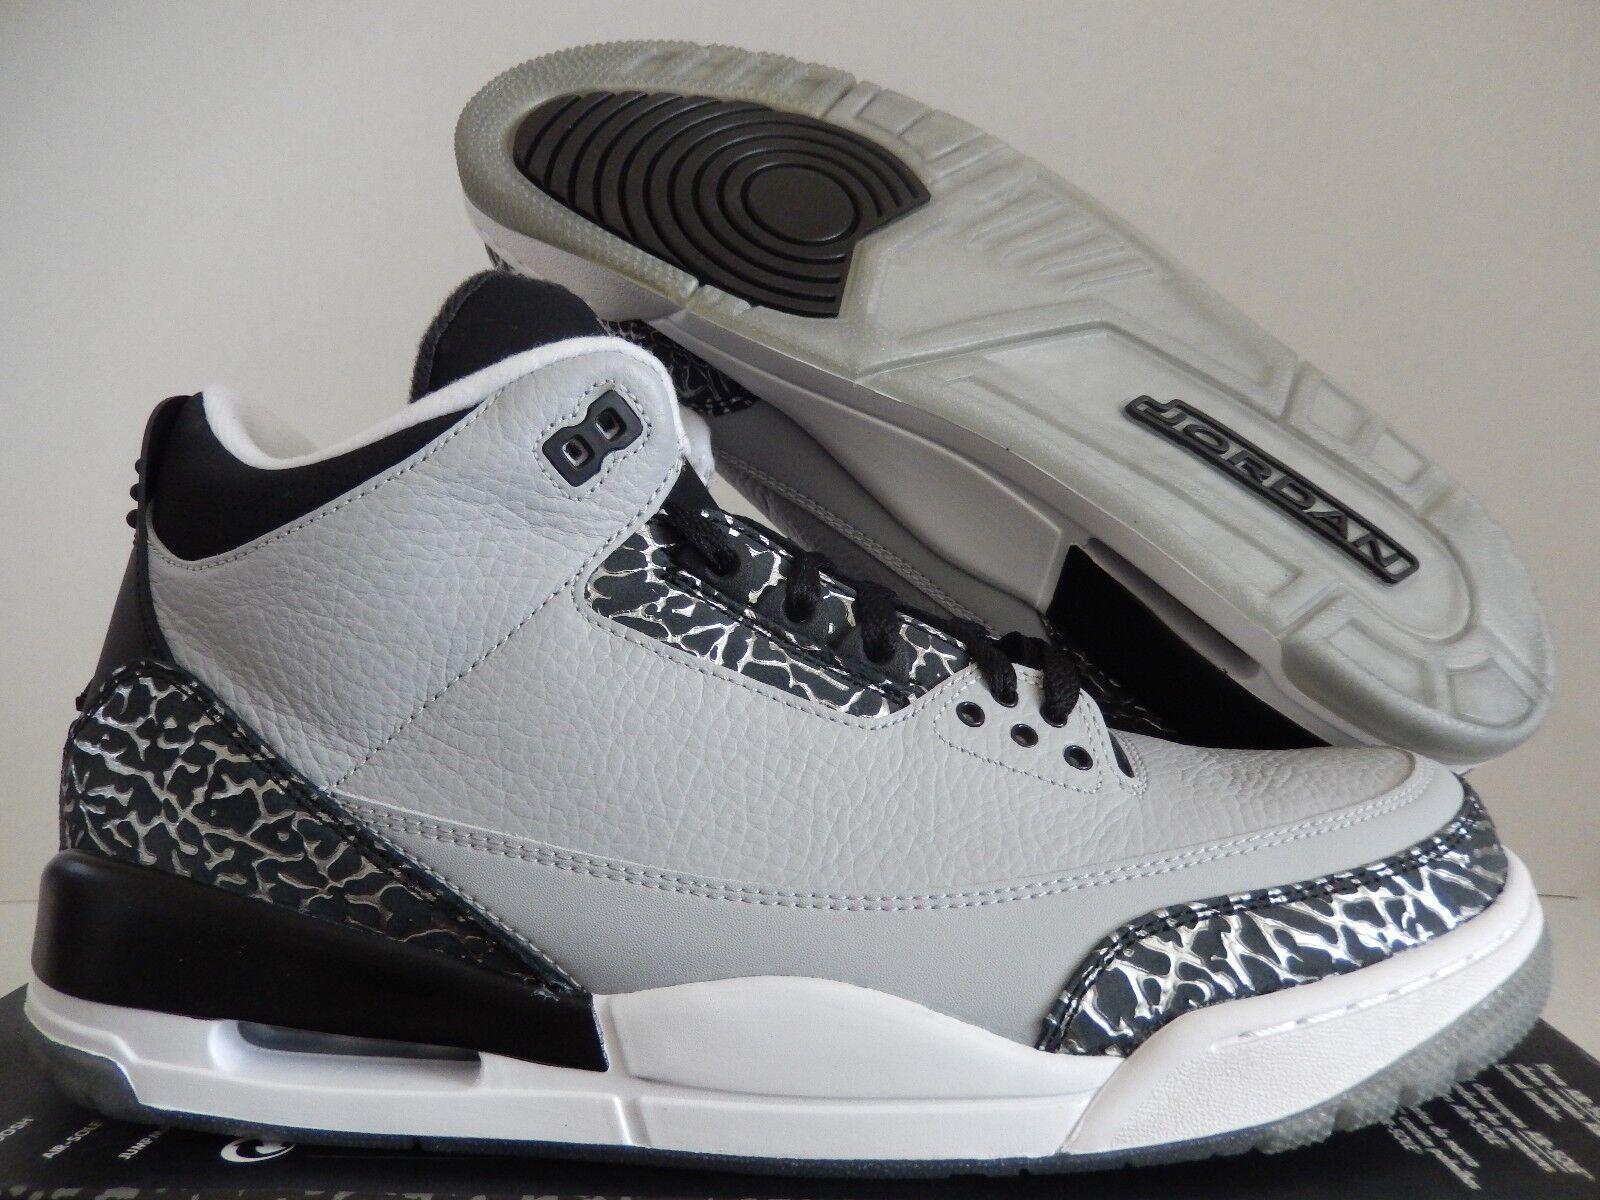 0b4f497a704 NIKE AIR JORDAN 3 RETRO WOLF GREY-WHITE-BLACK SZ 8 [136064-004]  nckrzw7488-Athletic Shoes